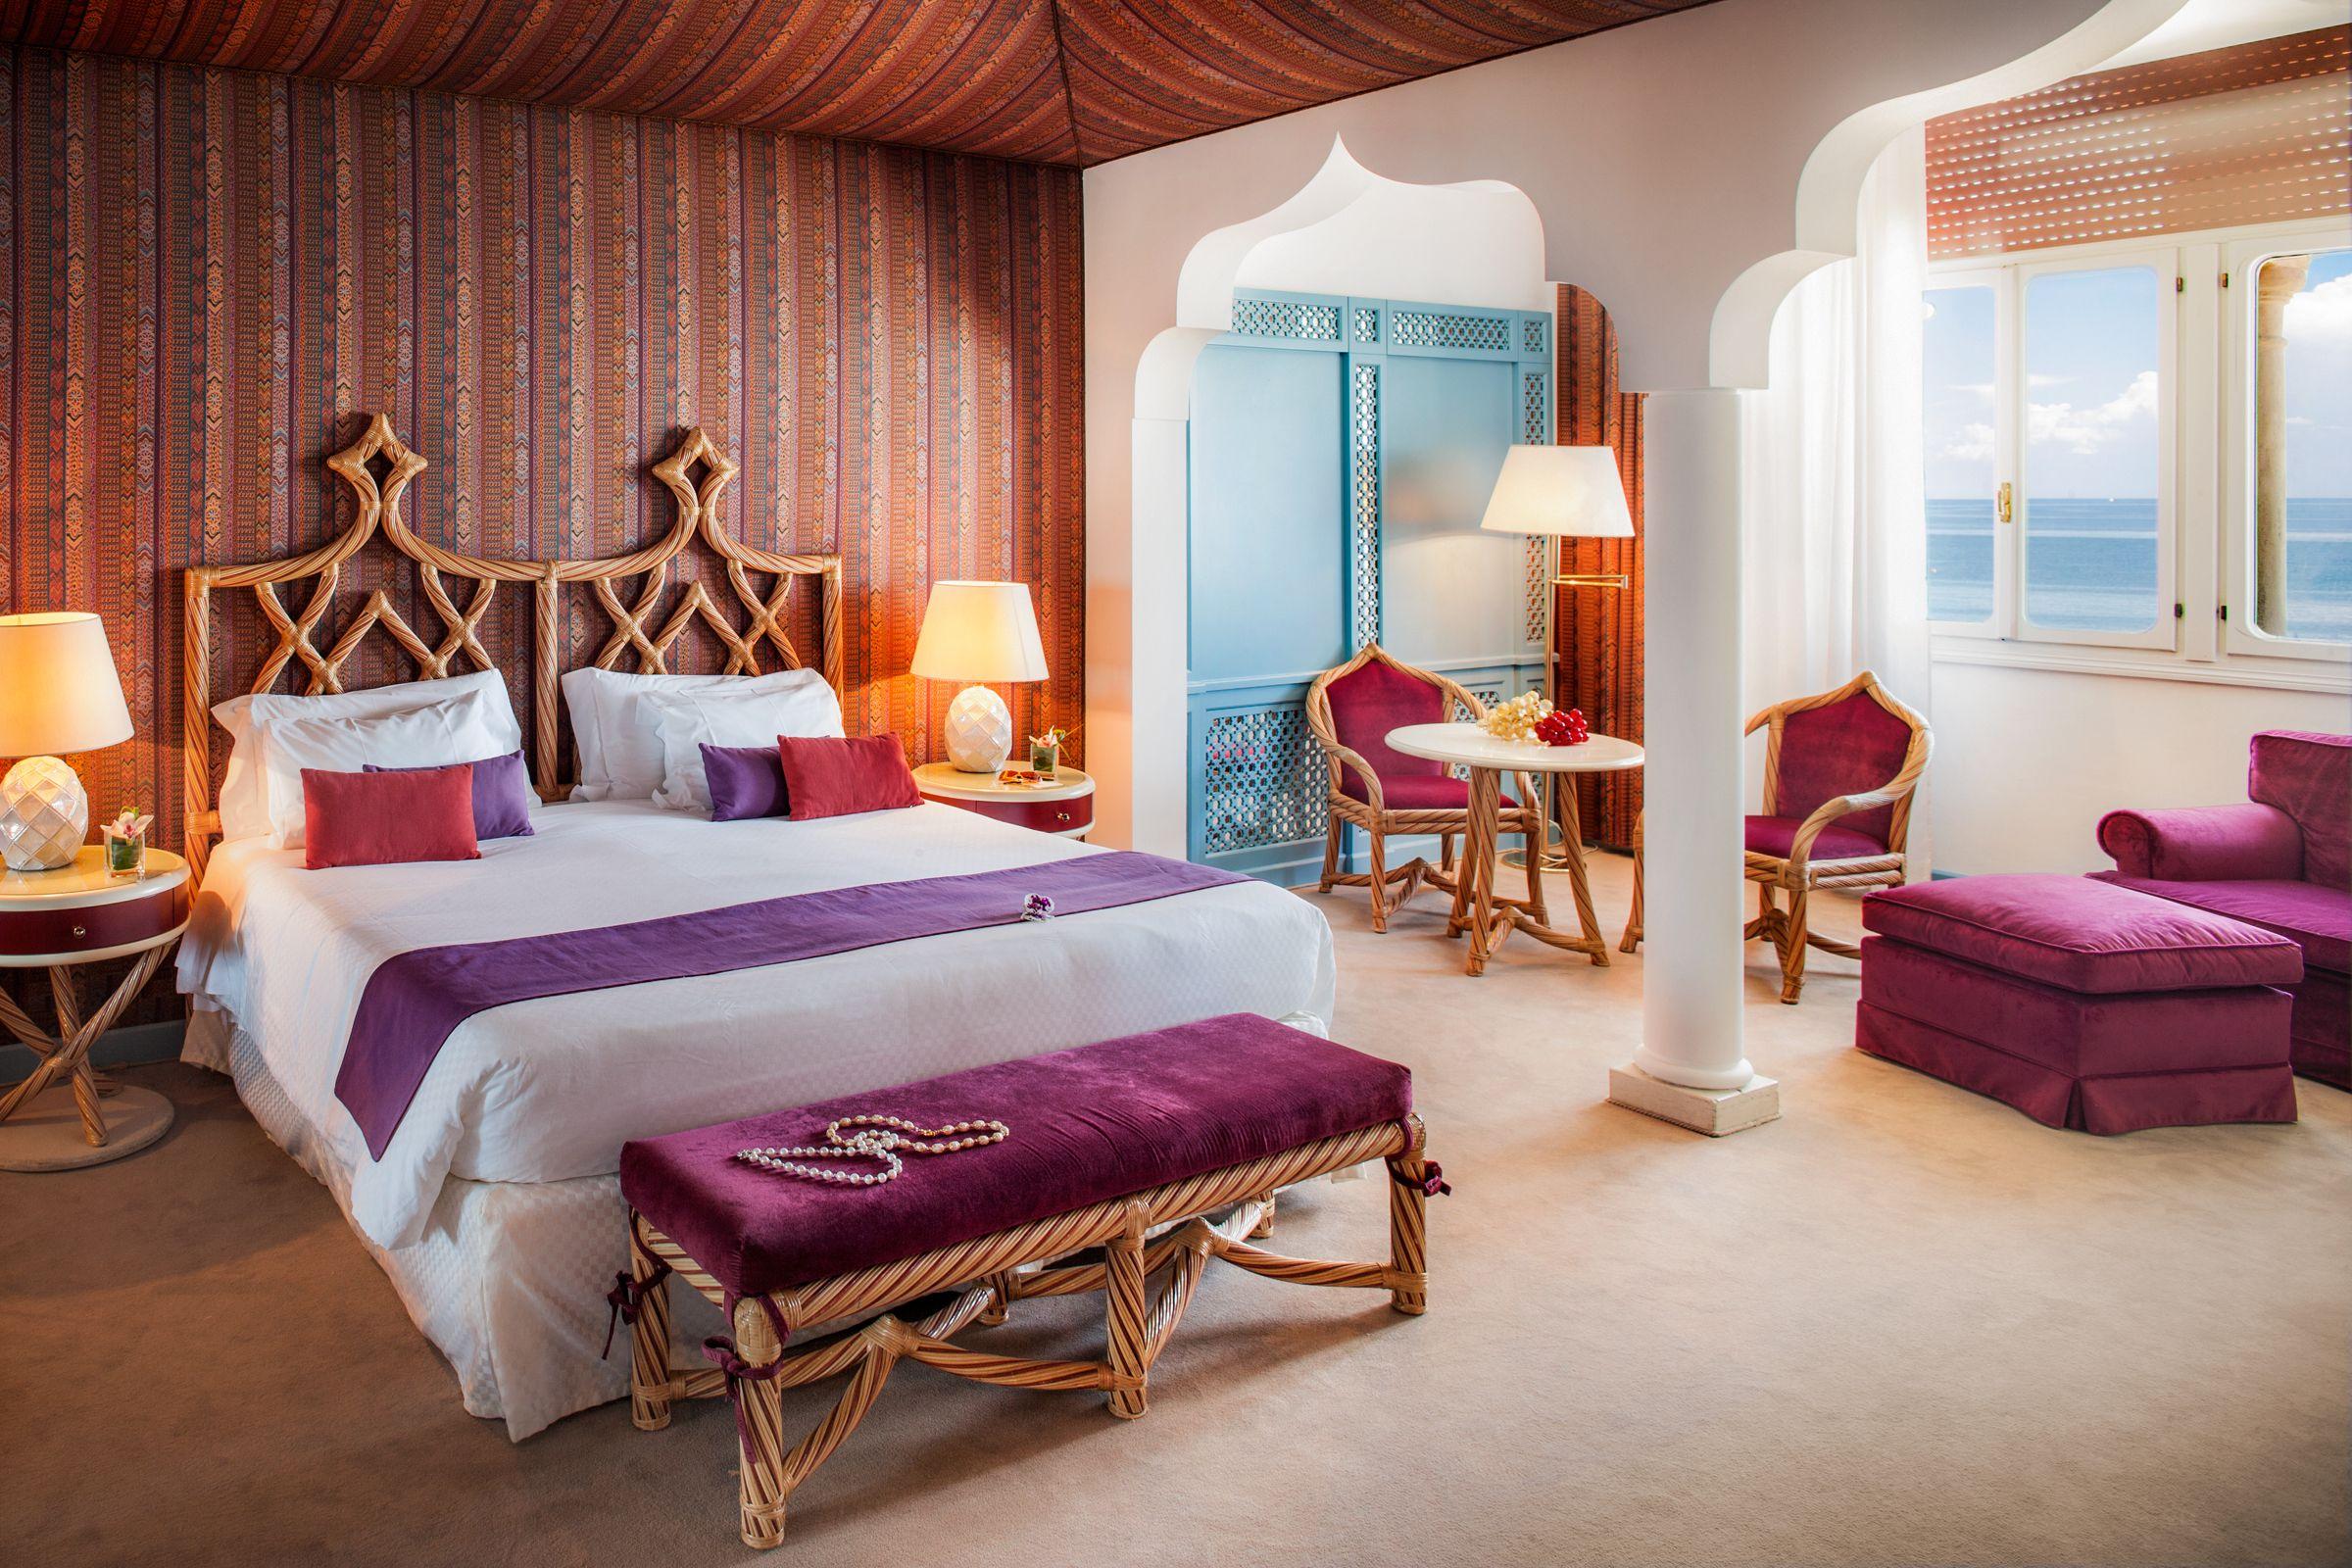 Grand Deluxe Double Room sea view, Hotel Excelsior - Venice Lido ...